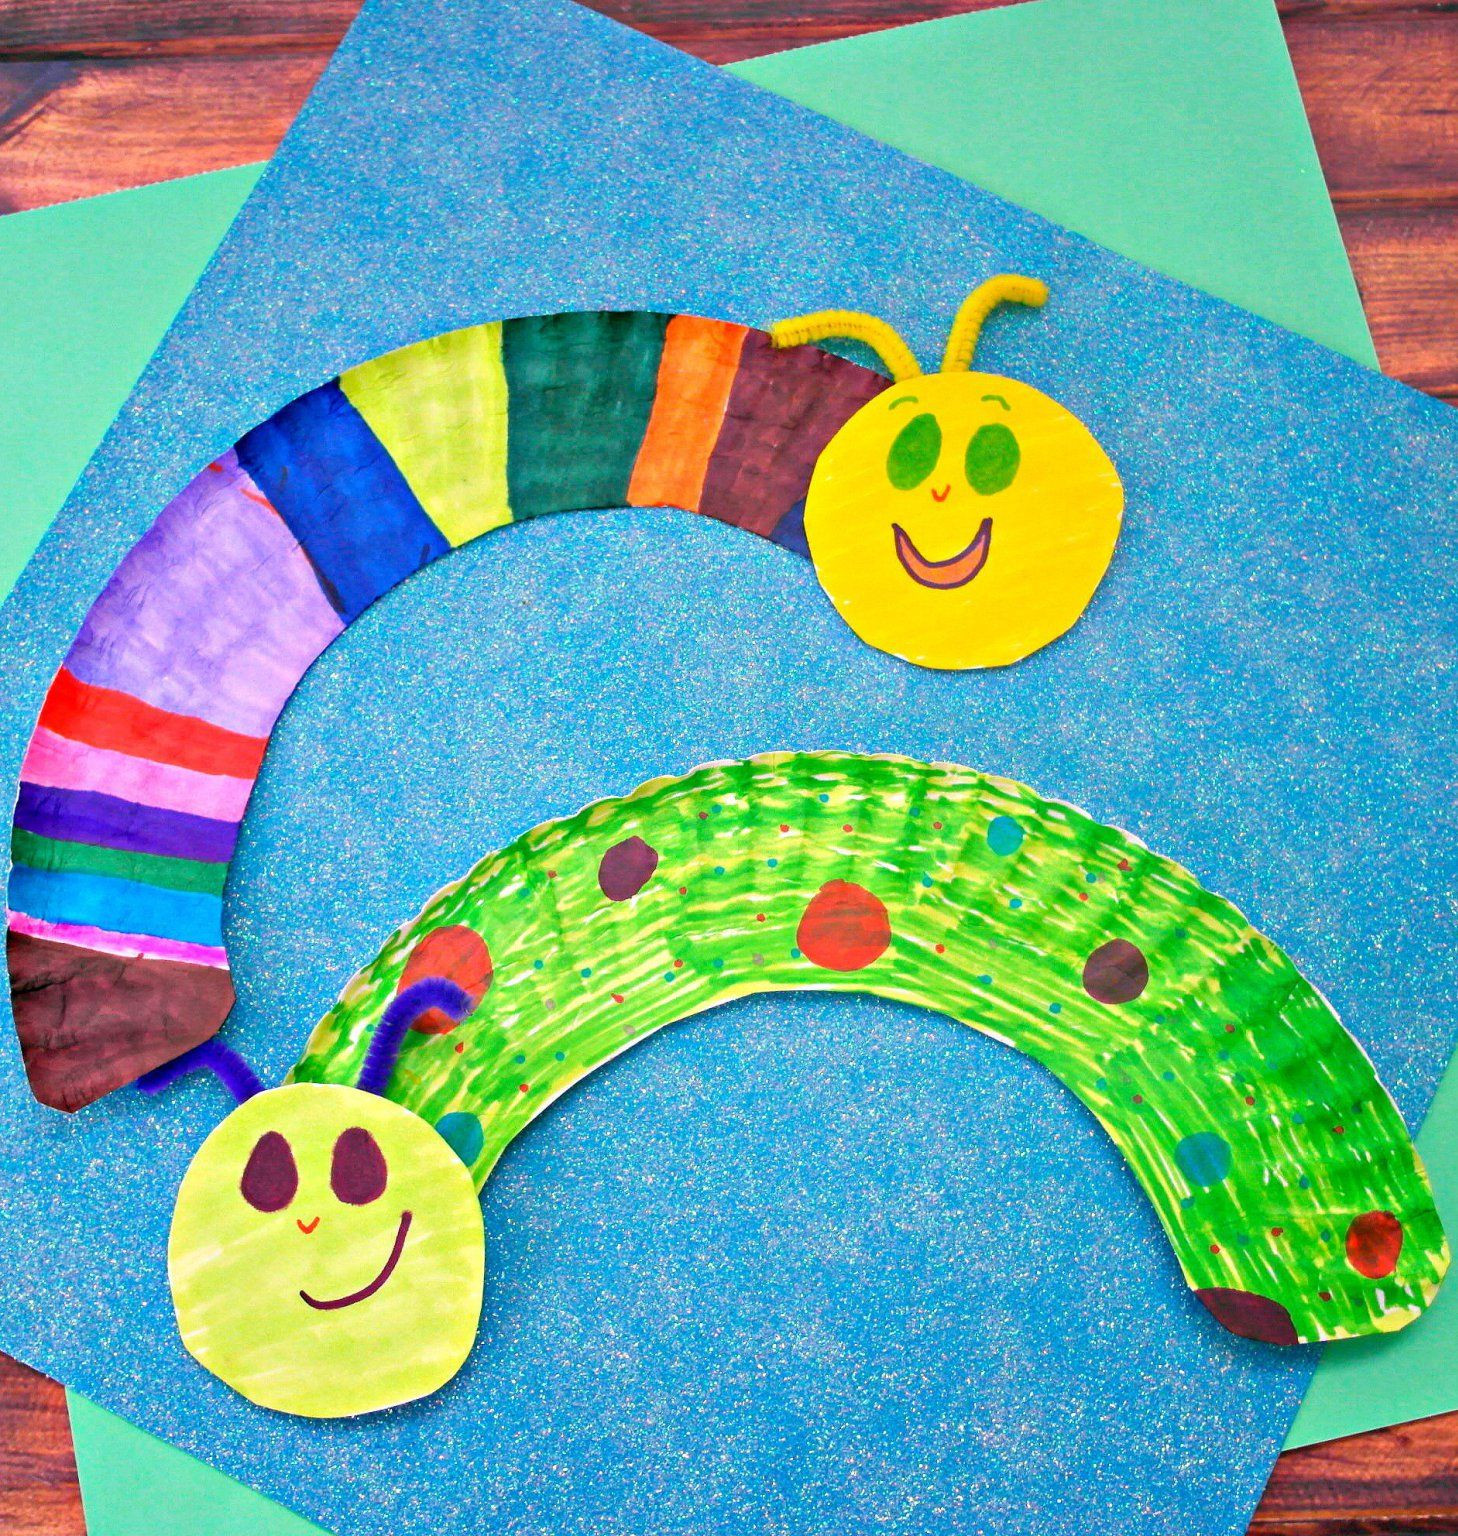 Preschool Arts And Craft  Paper Plate Caterpillars For kids